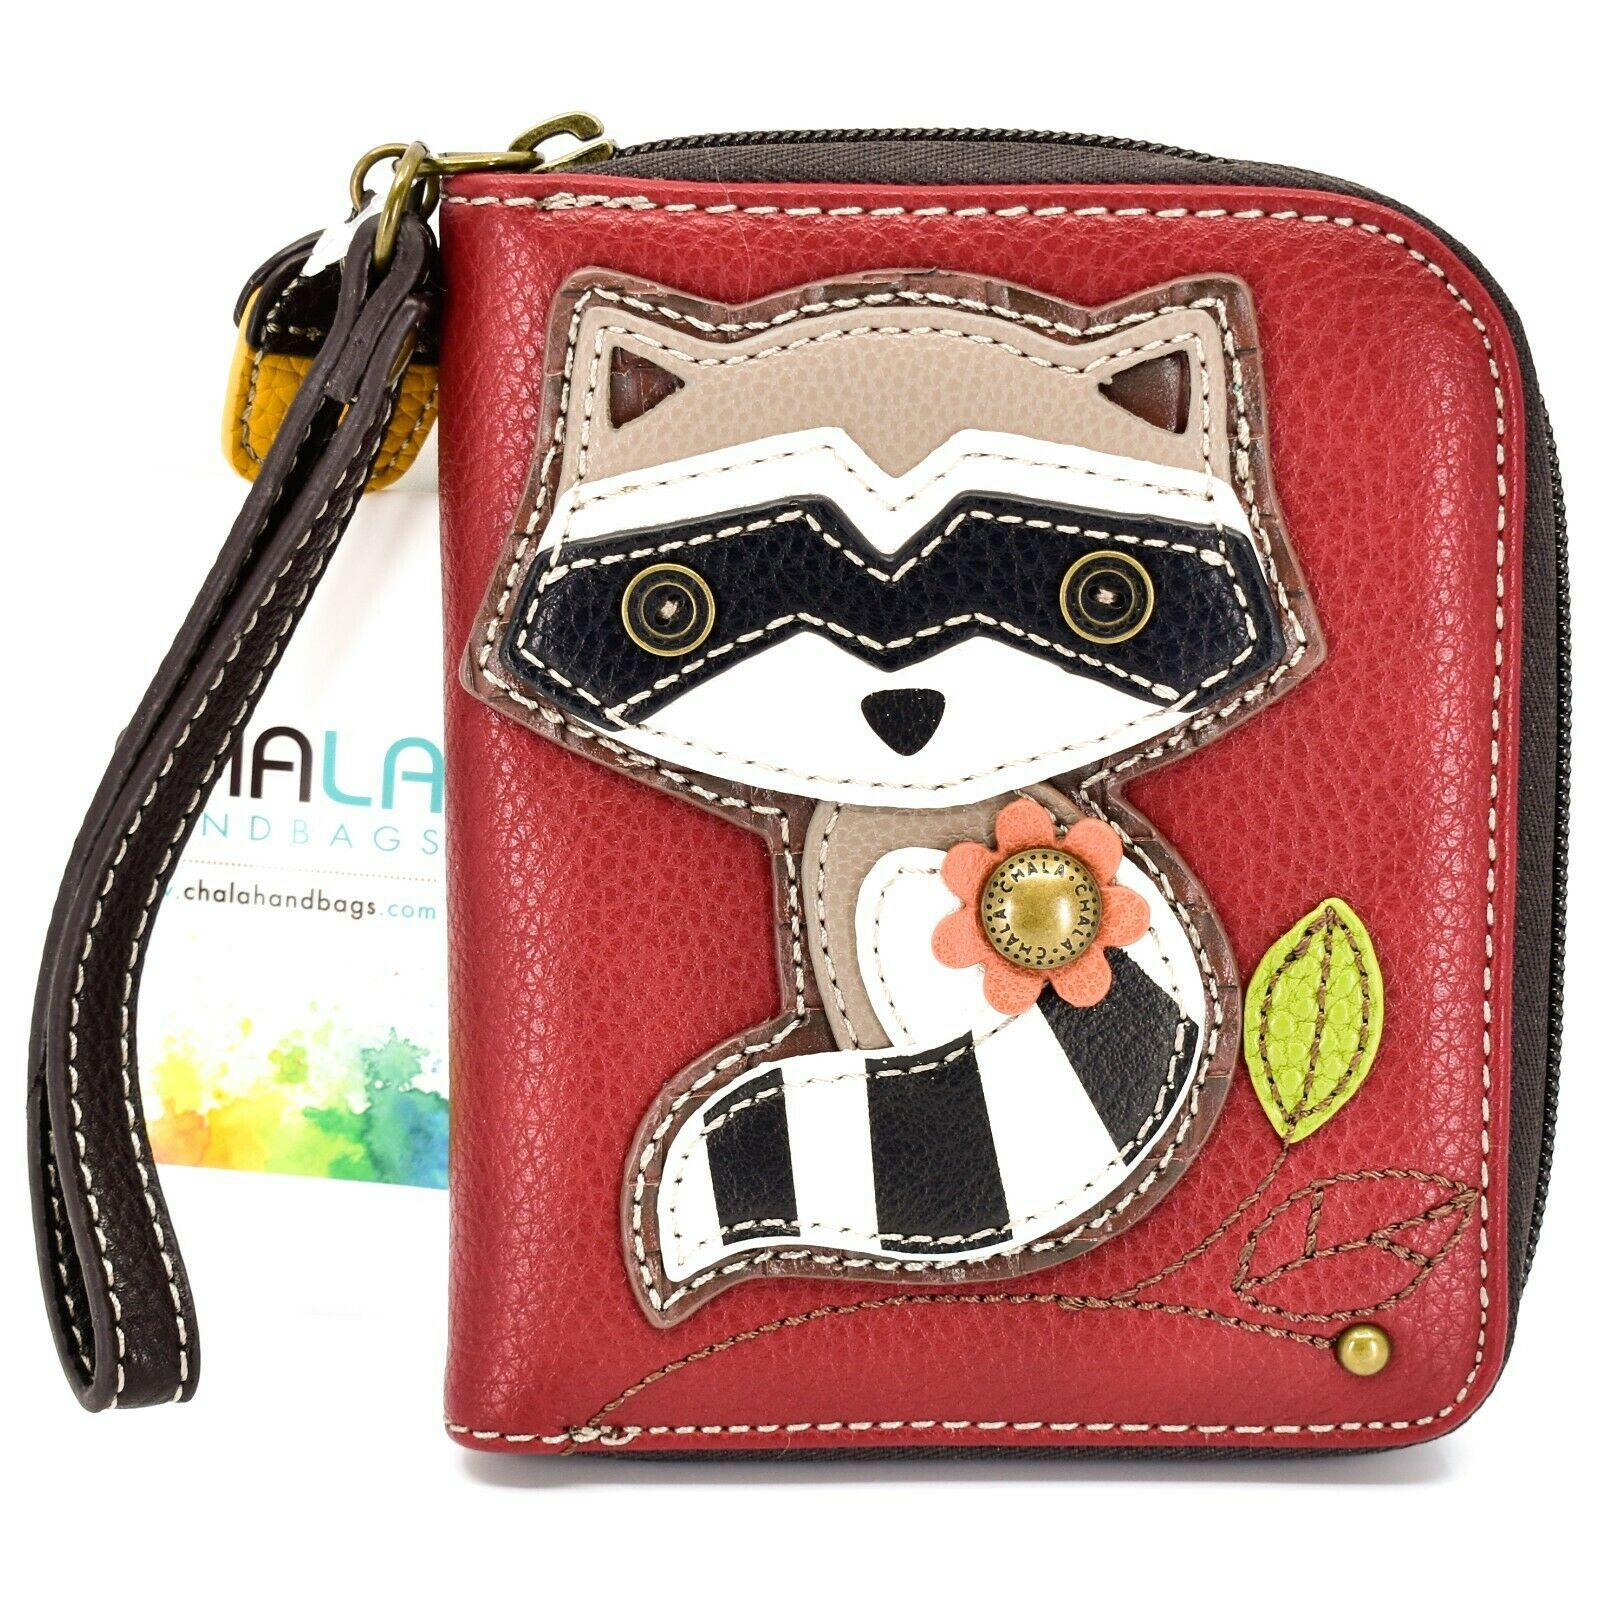 Chala Handbags Faux Leather Maroon Burgundy Raccoon Zip Around Wristlet Wallet